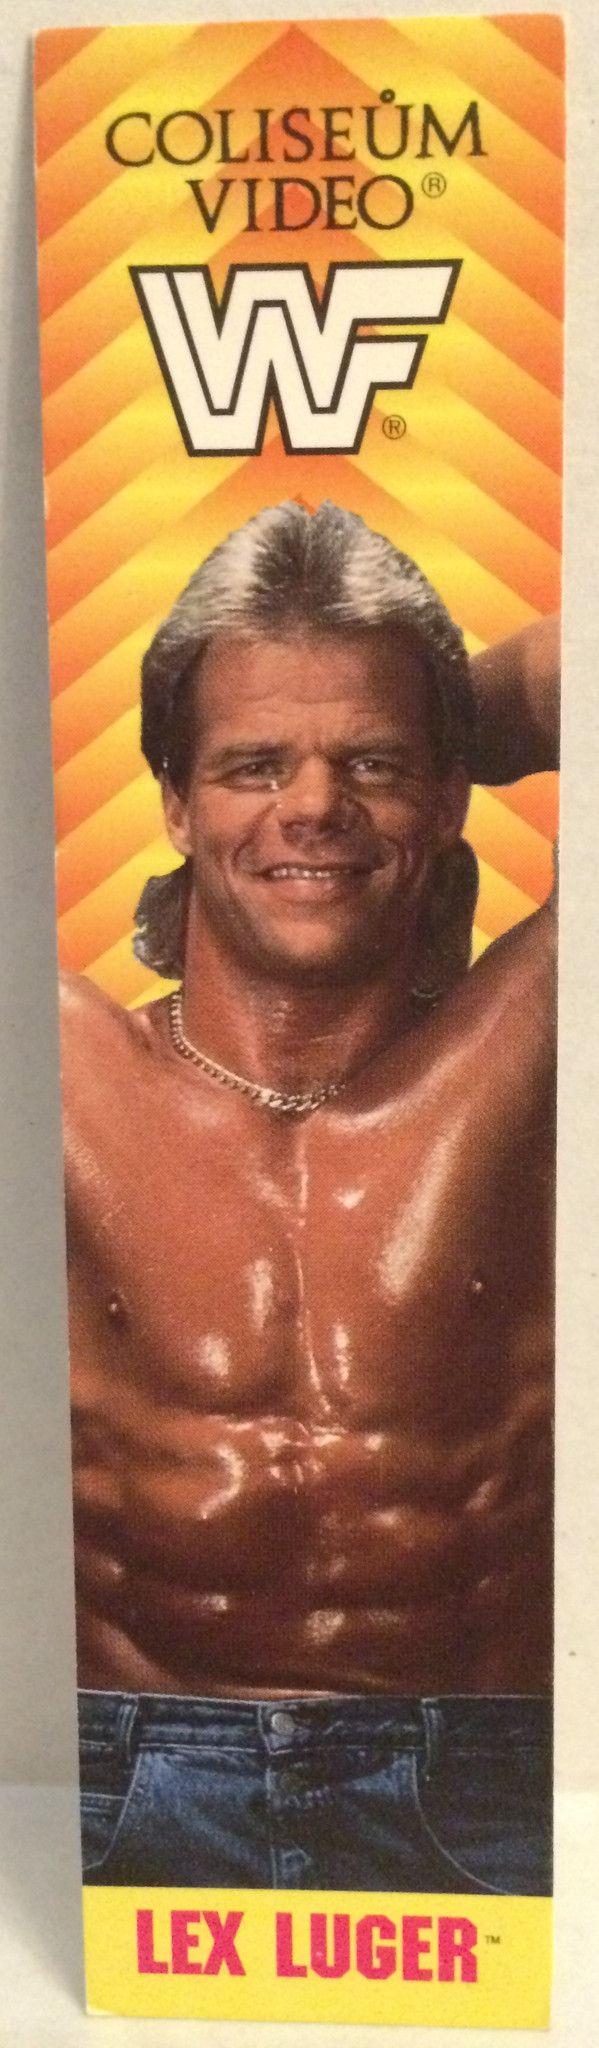 (TAS032602) - Coliseum Video WWF WWE Wrestling Book Mark - Lex Lugar